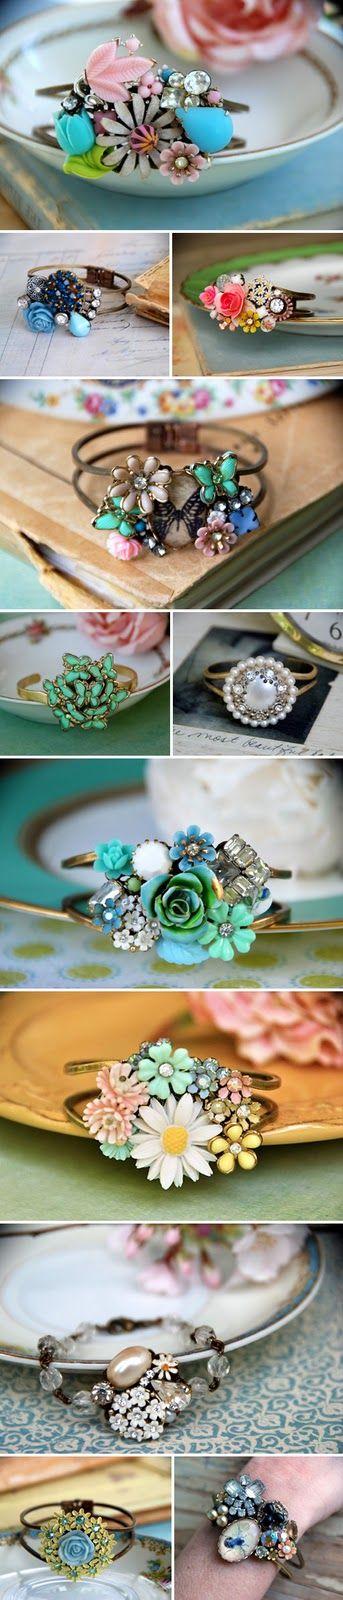 vintage jewelry, repurposed